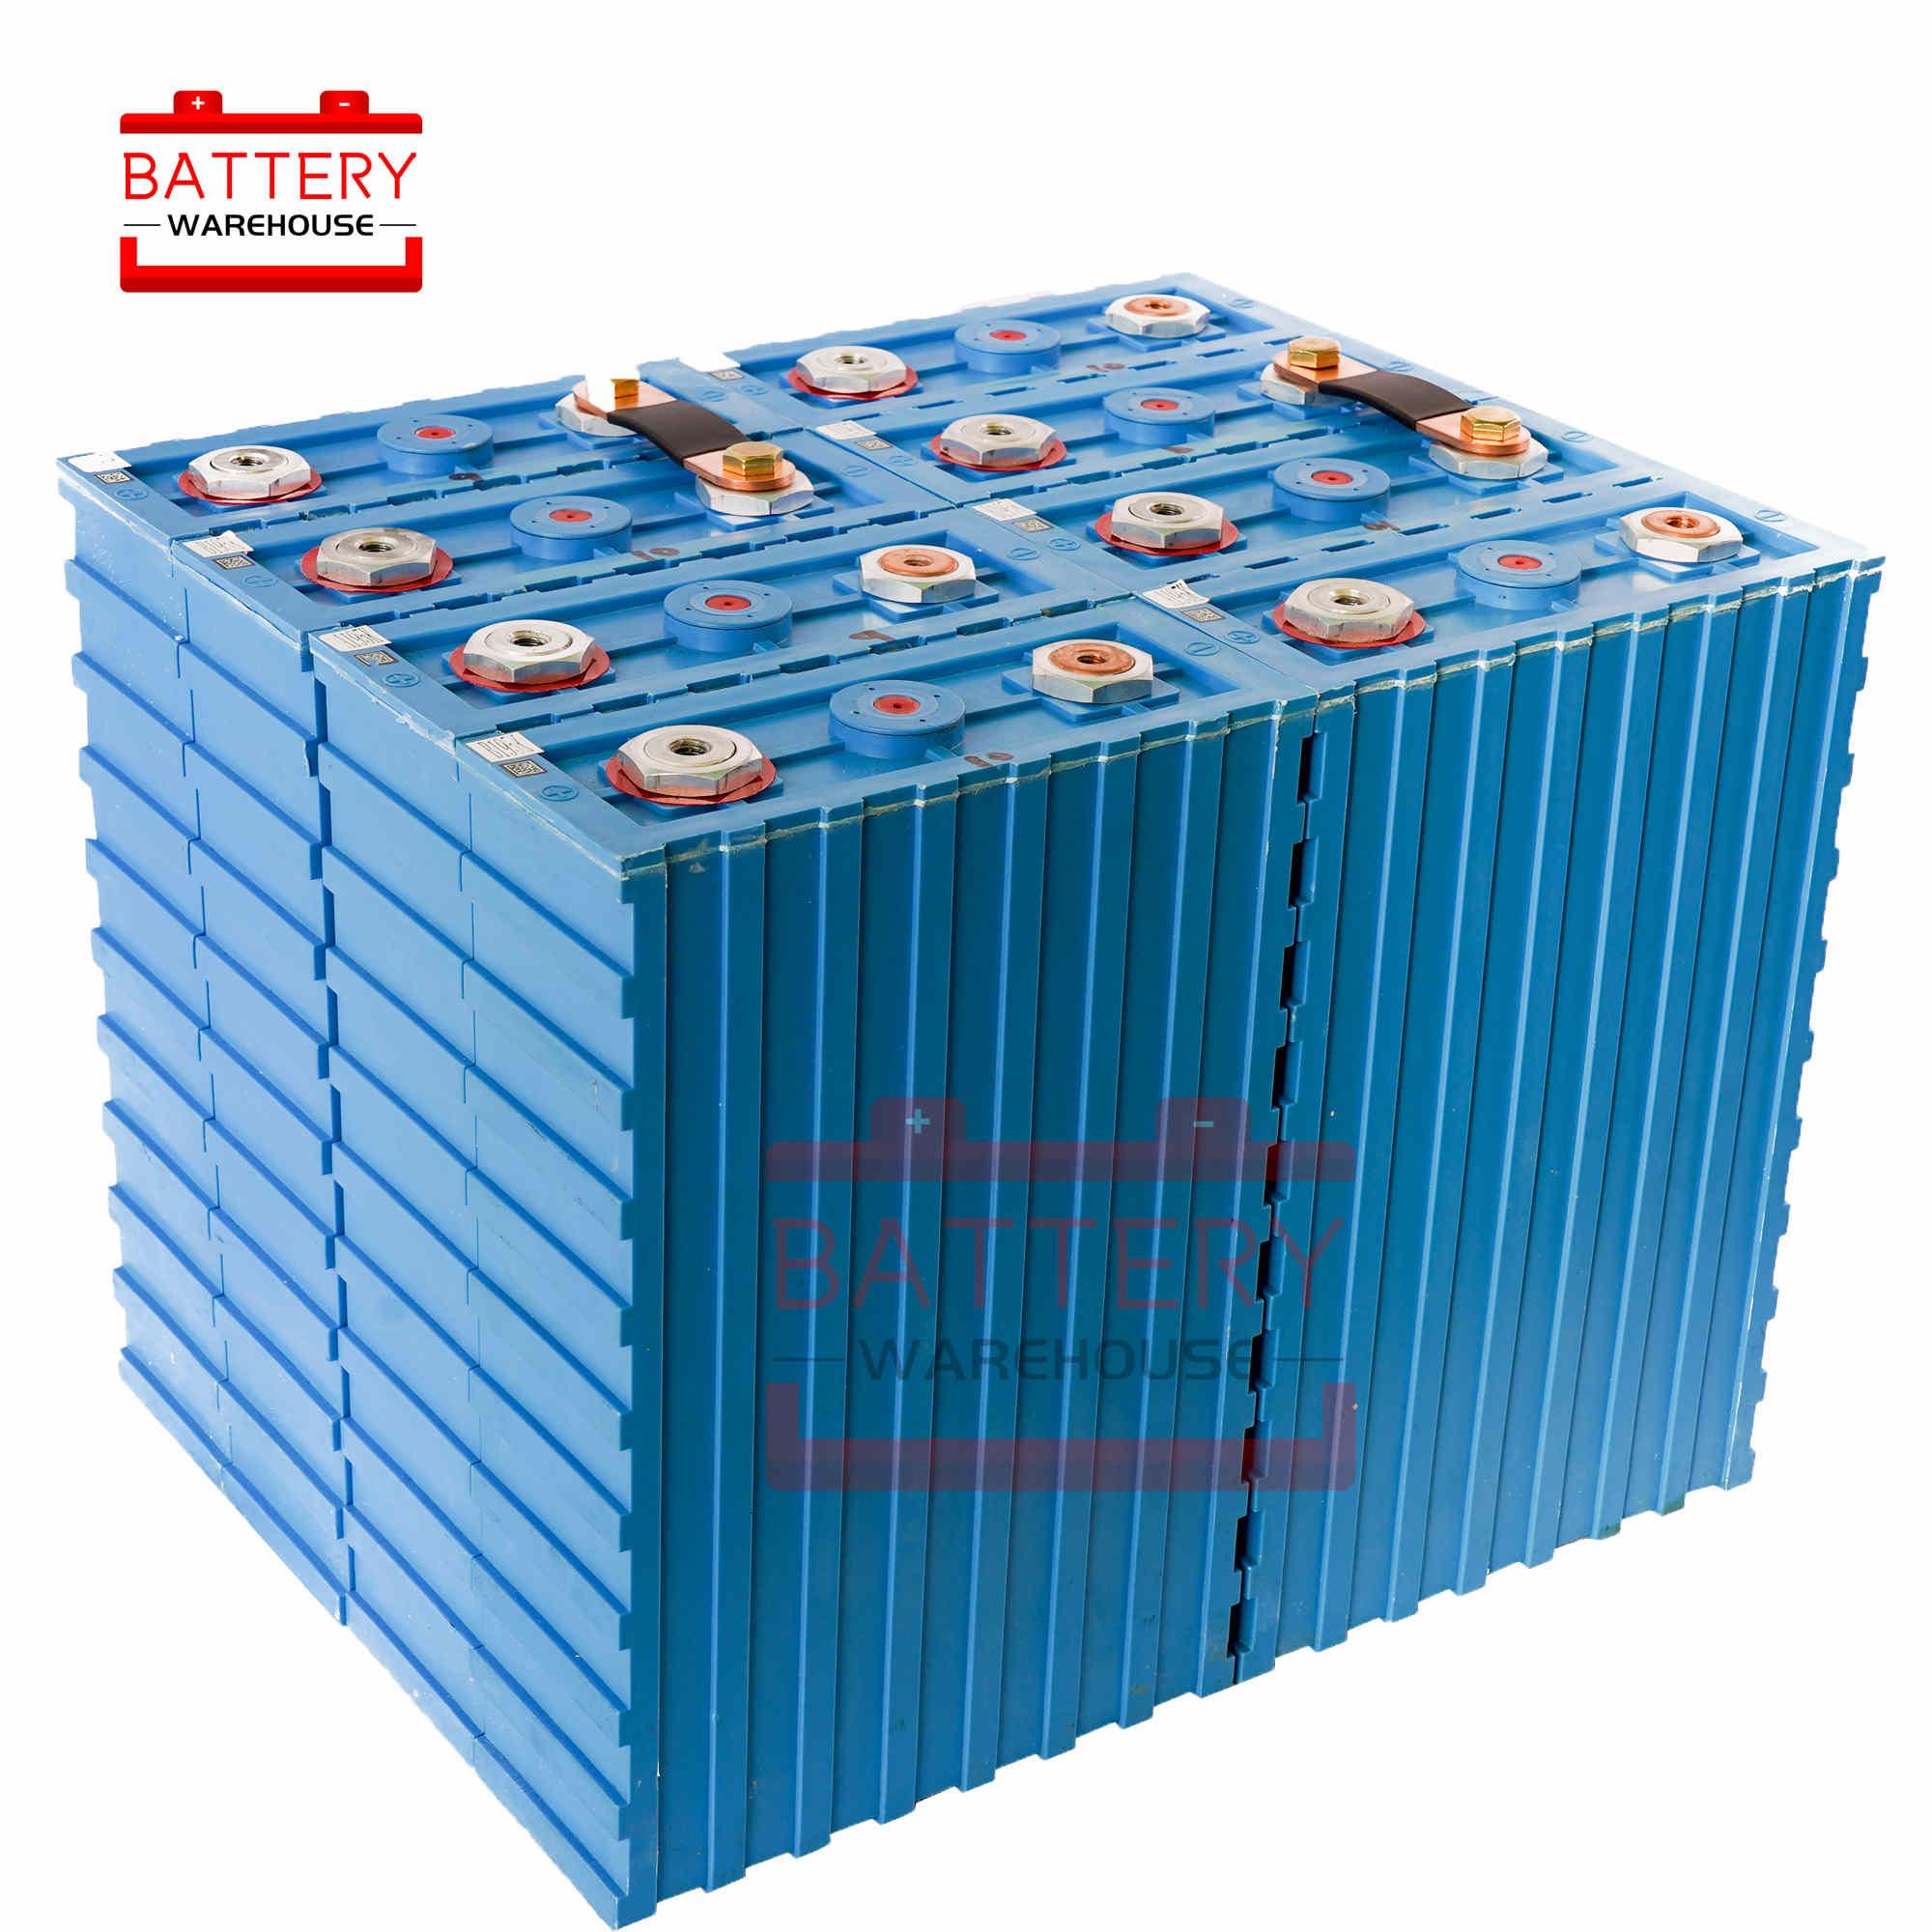 CALB 32 шт. 3.2V180ah LiFePo4 аккумуляторная батарея SE180AHA 96 в 48v200AH 24 В для упаковки EV солнечные батареи США ЕС AU без налогов